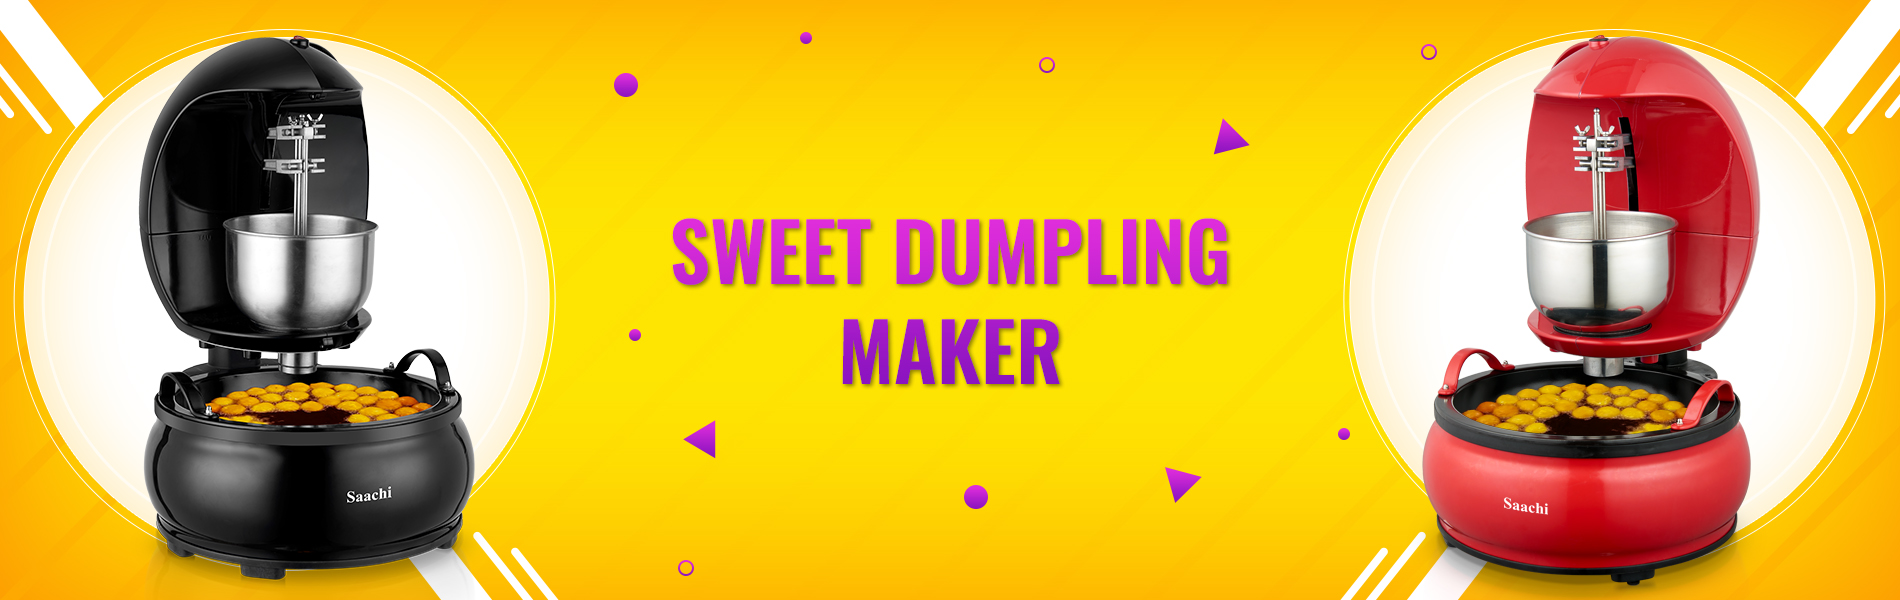 Sweet-dumpling-maker